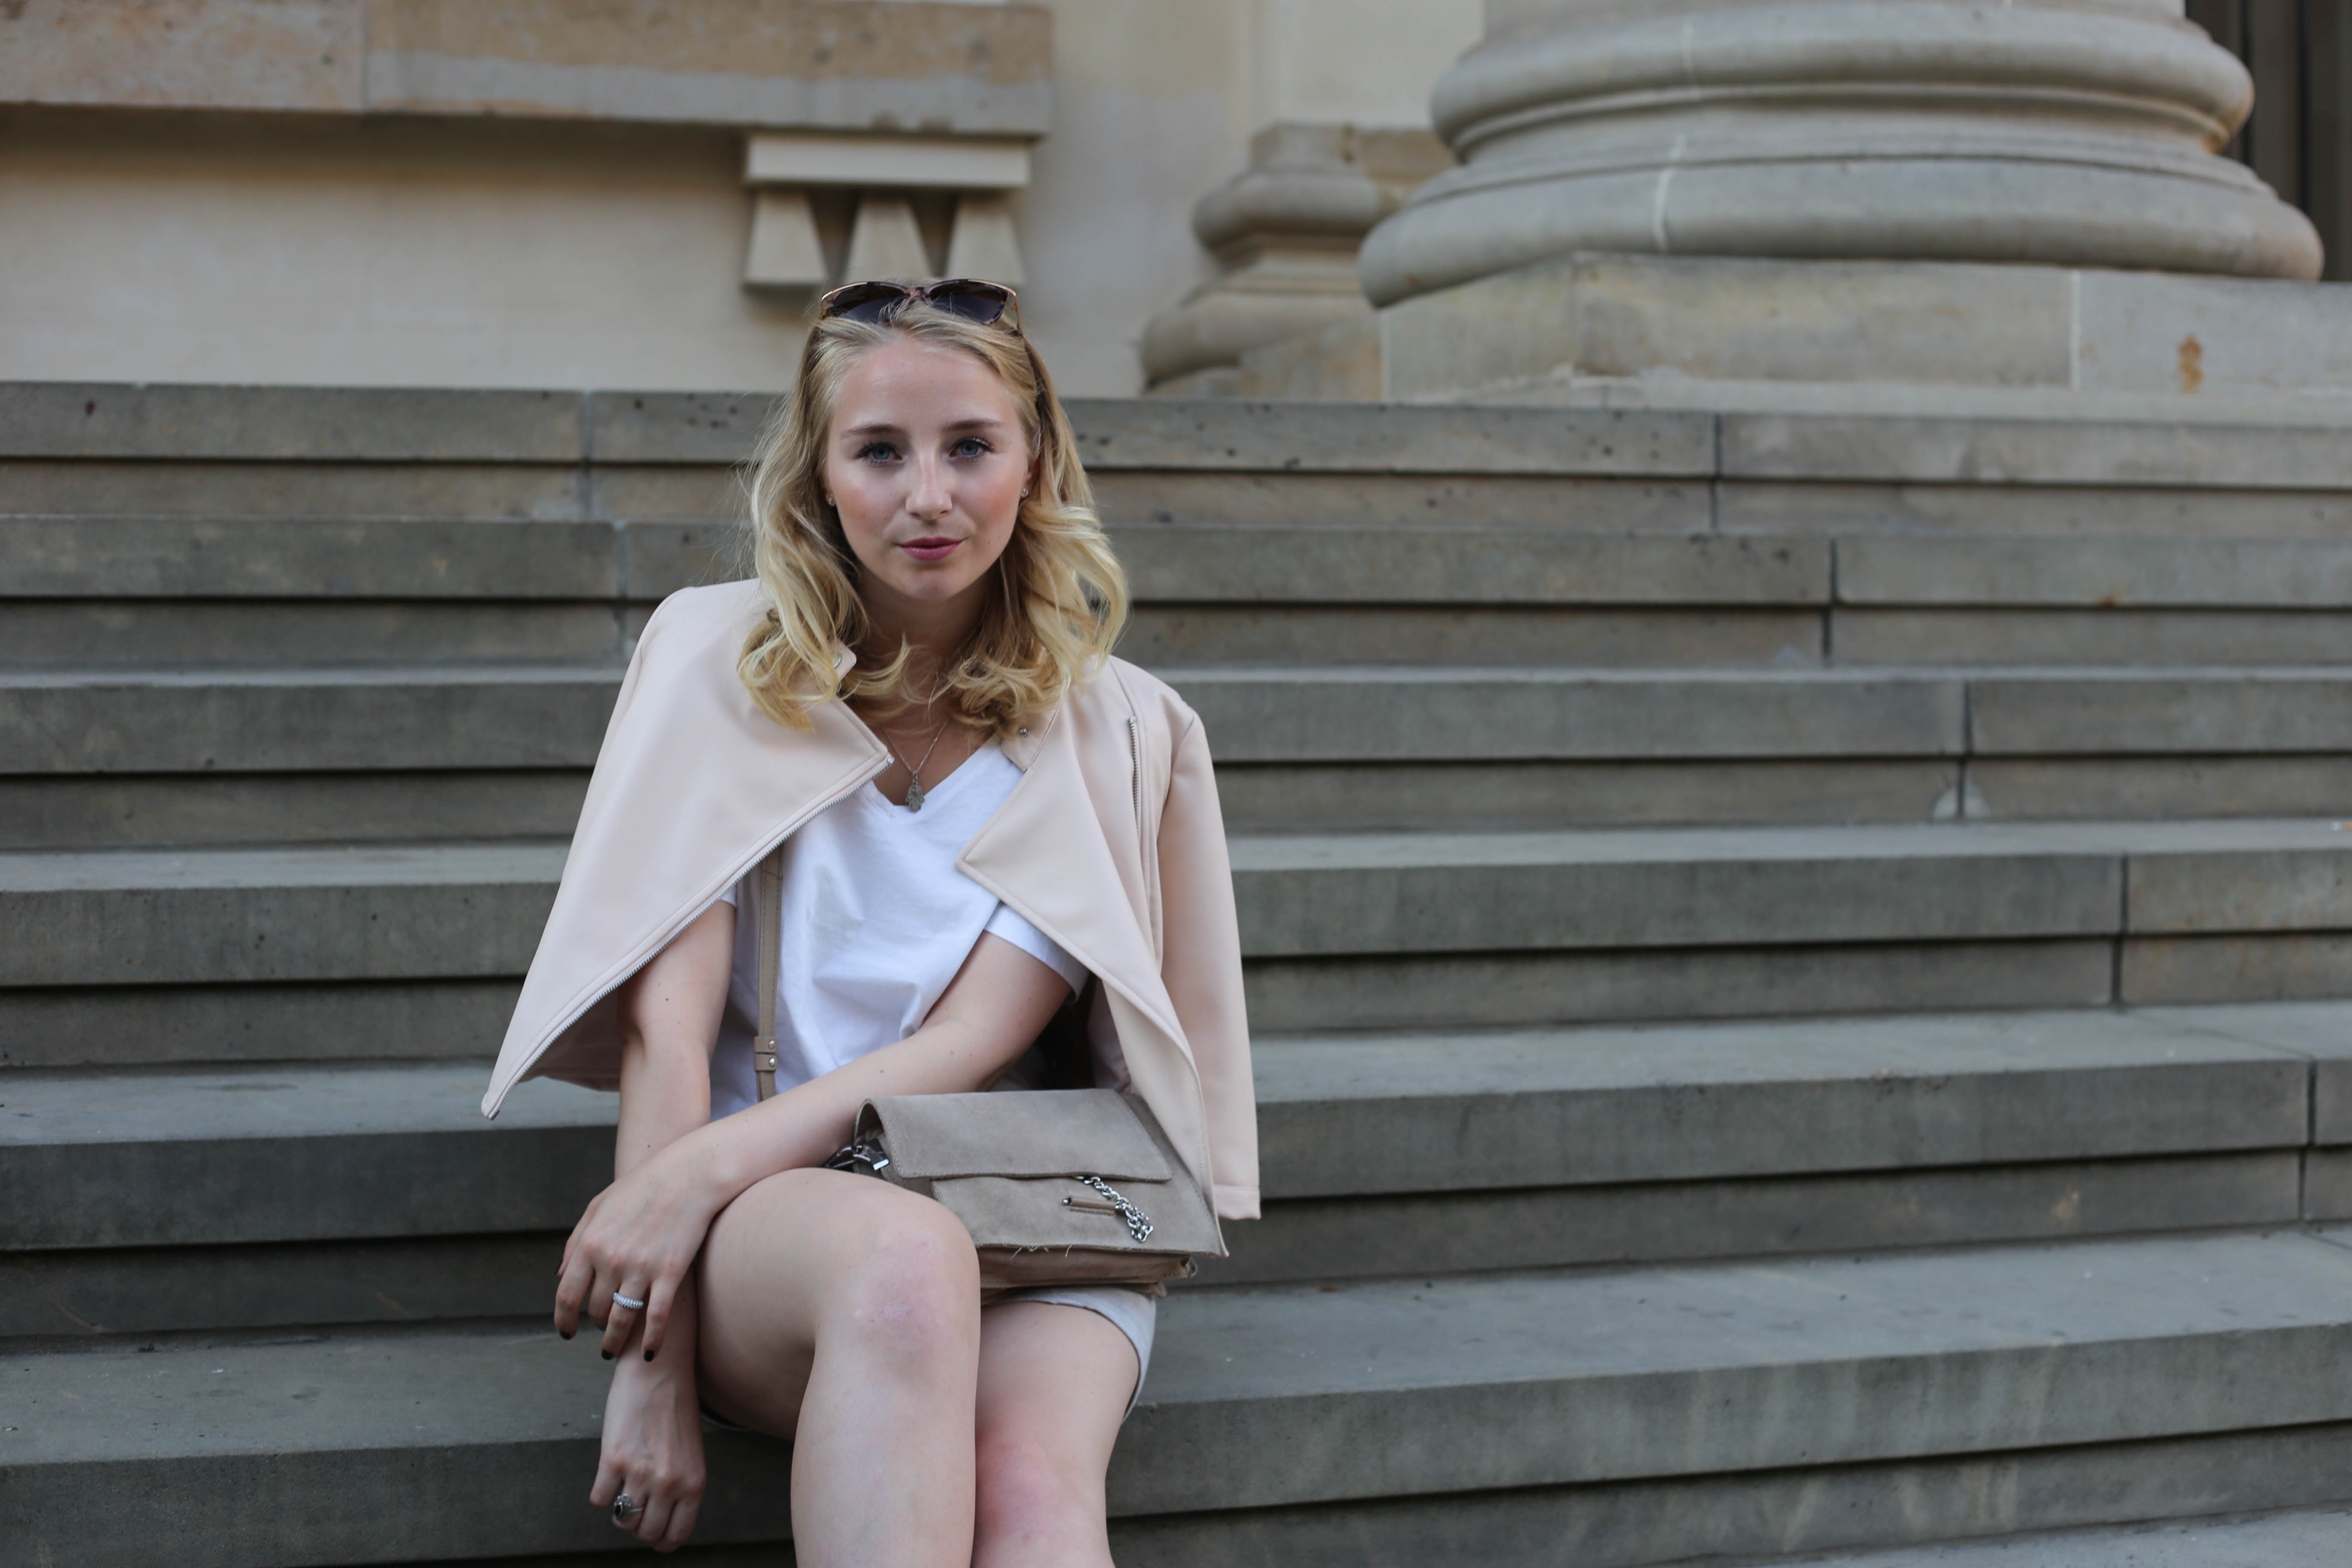 rosa-lederjacke-mango-klotzabsatz-sandalen-fashionblog-berlin-mode-blog-outfit_2393 (1)